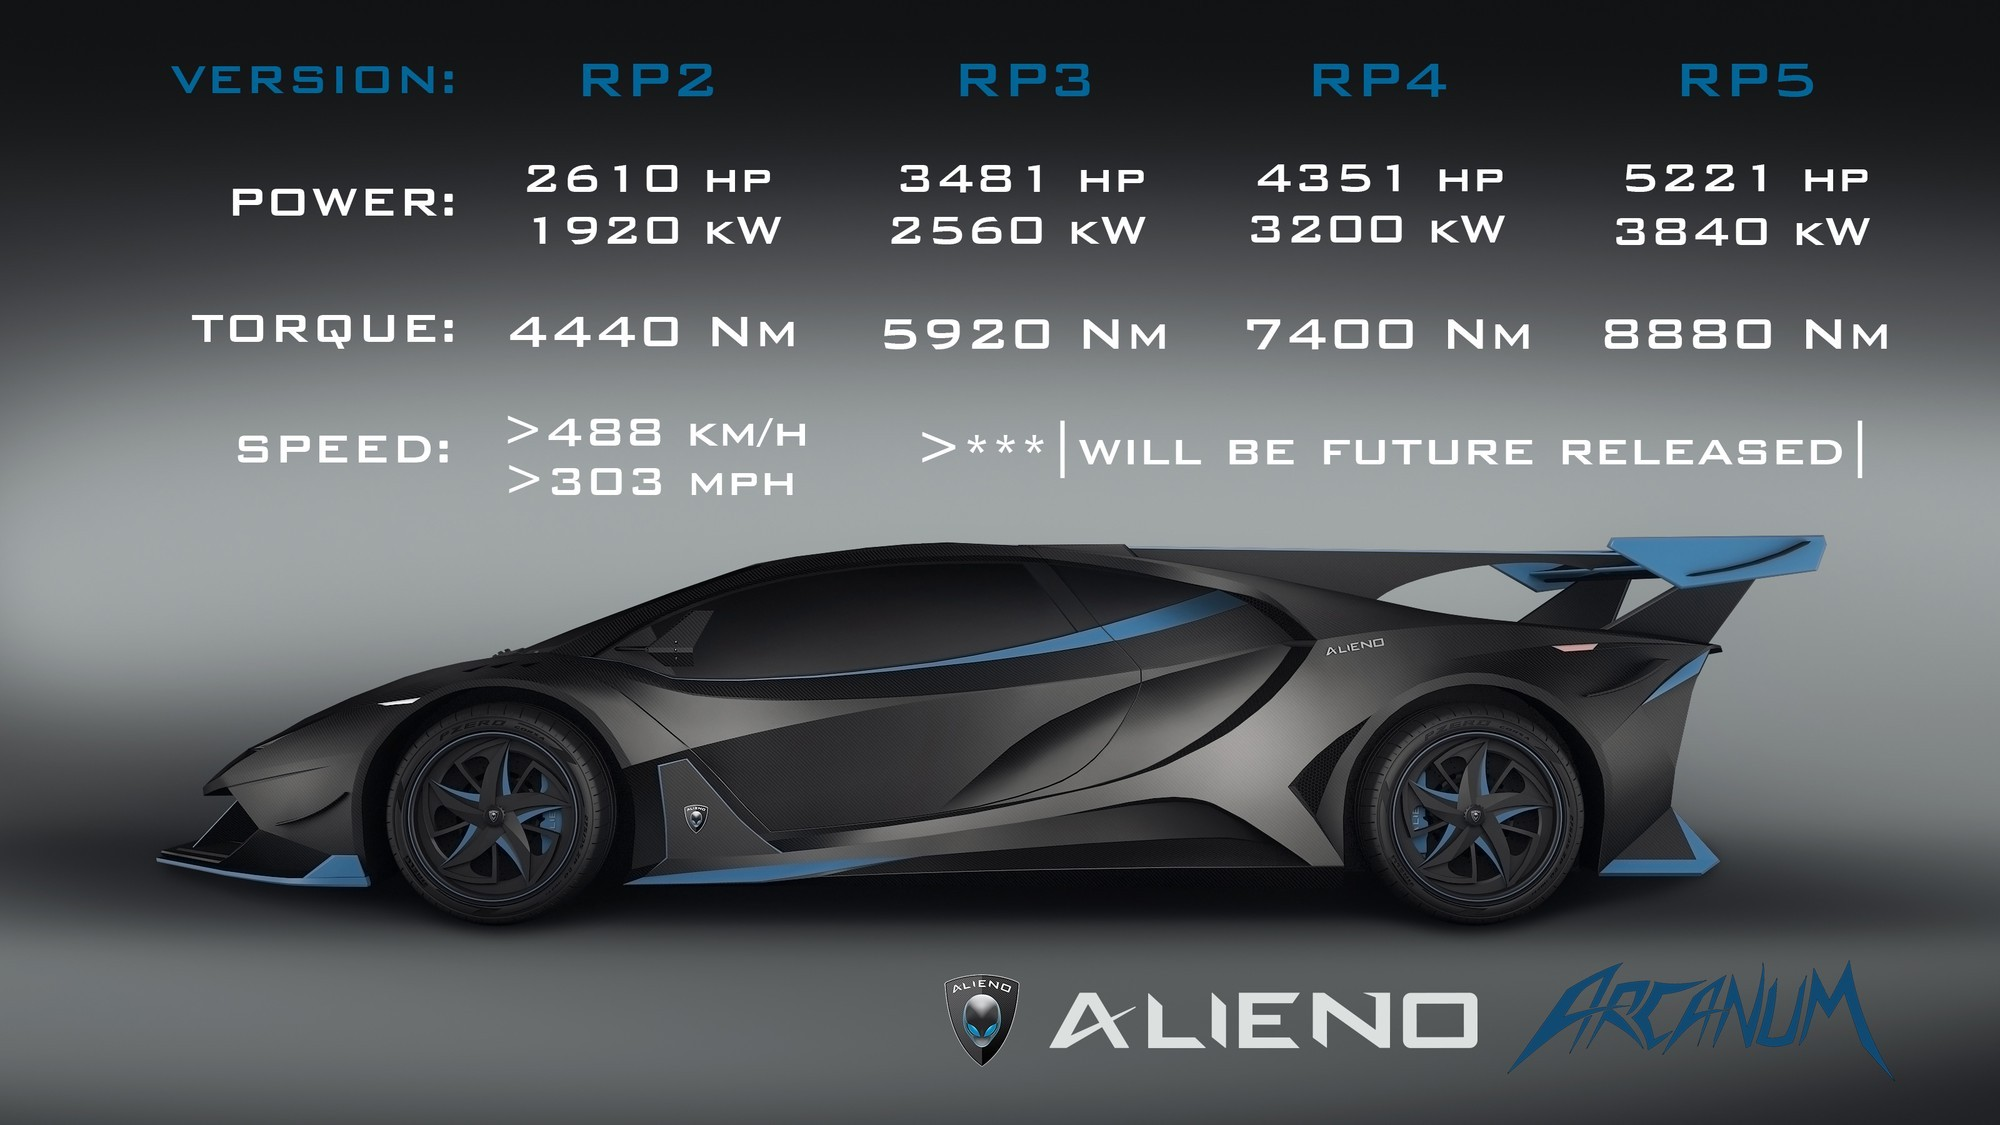 Alieno Arcanum — сельский гиперкар из Болгарии: 24 мотора, 5221 л.с. и 8880 Нм